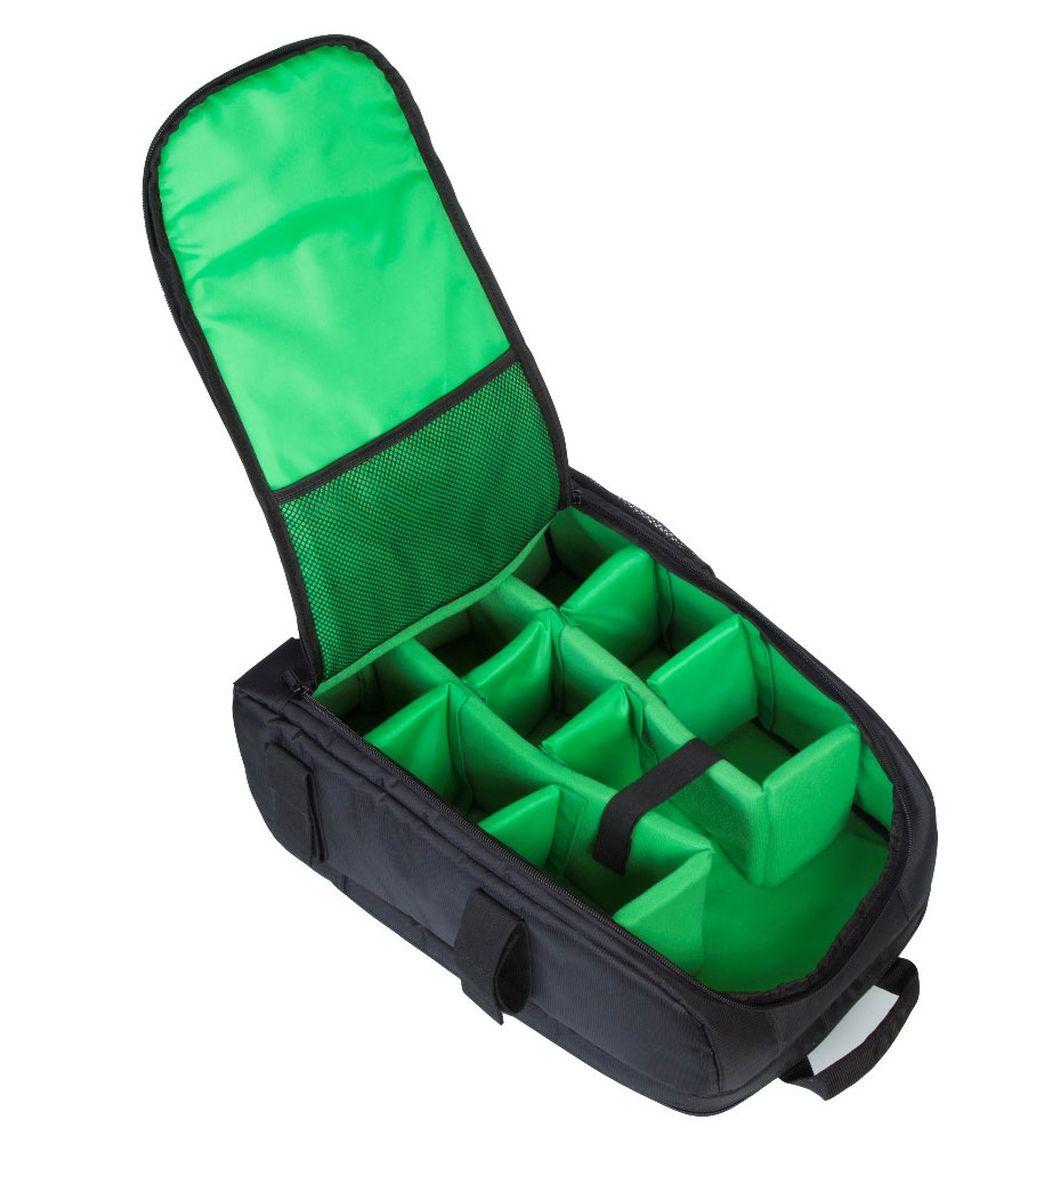 Riva 7490 SLR Backpack, Black рюкзак для зеркальной фотокамеры